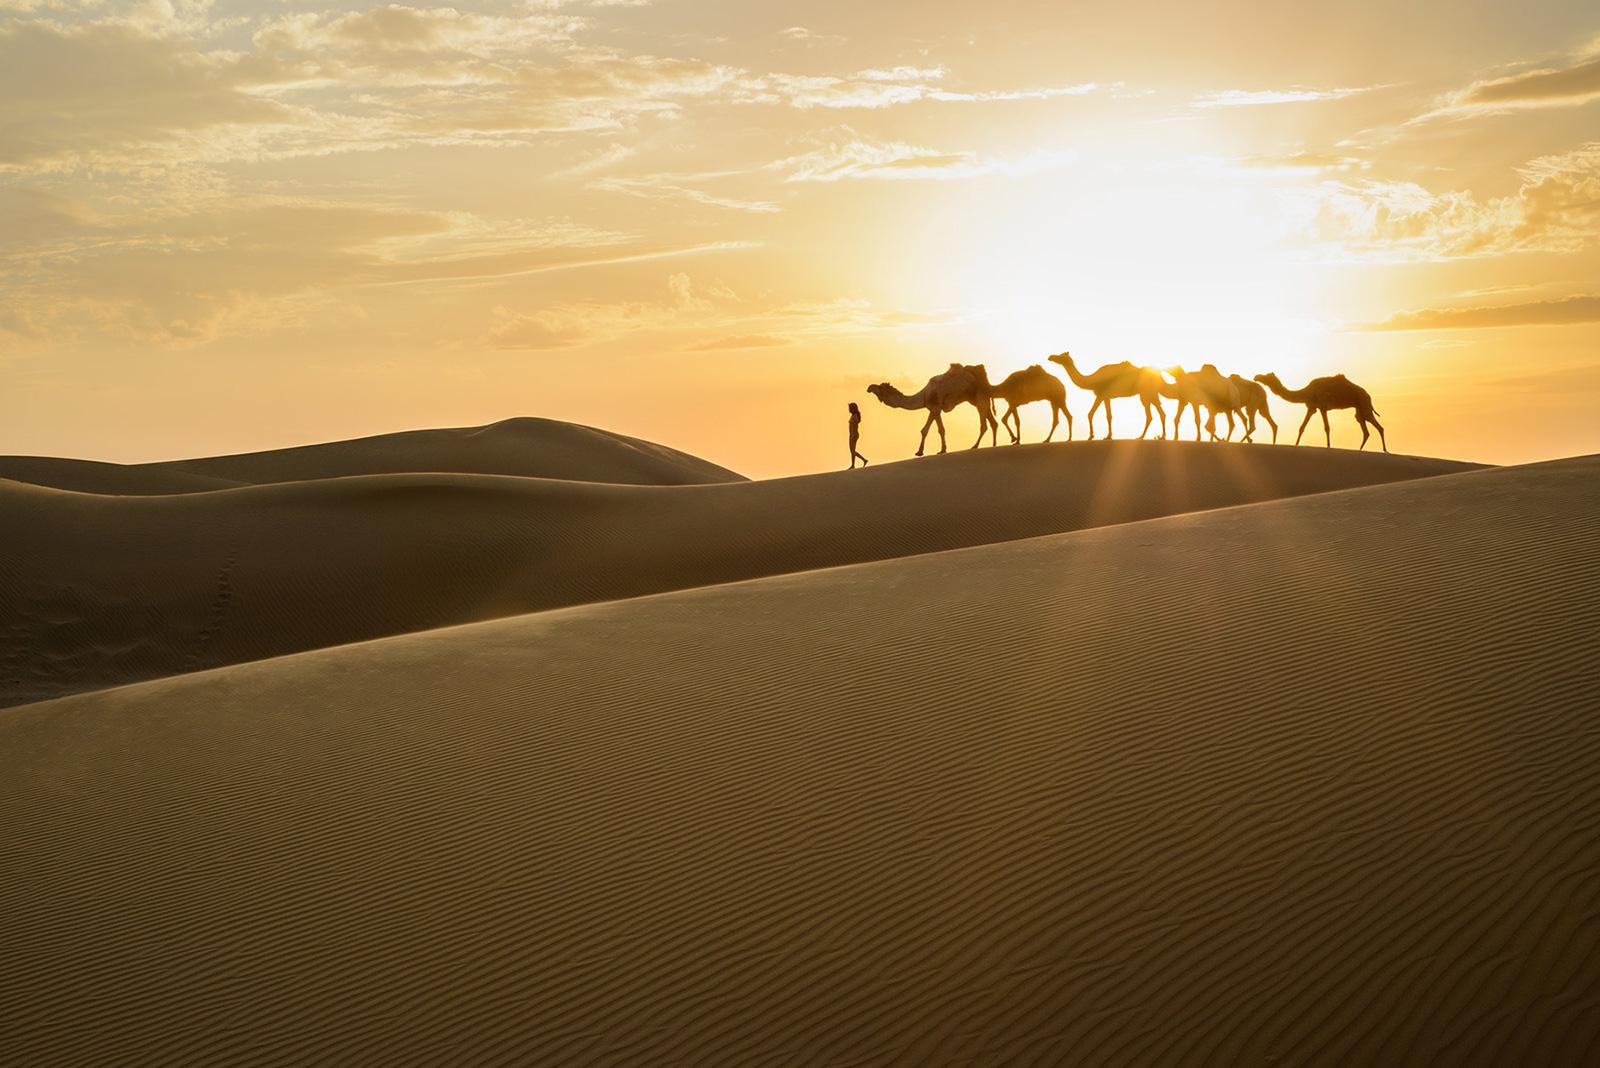 Siyala Dunes, <br>India, Thar Desert 5